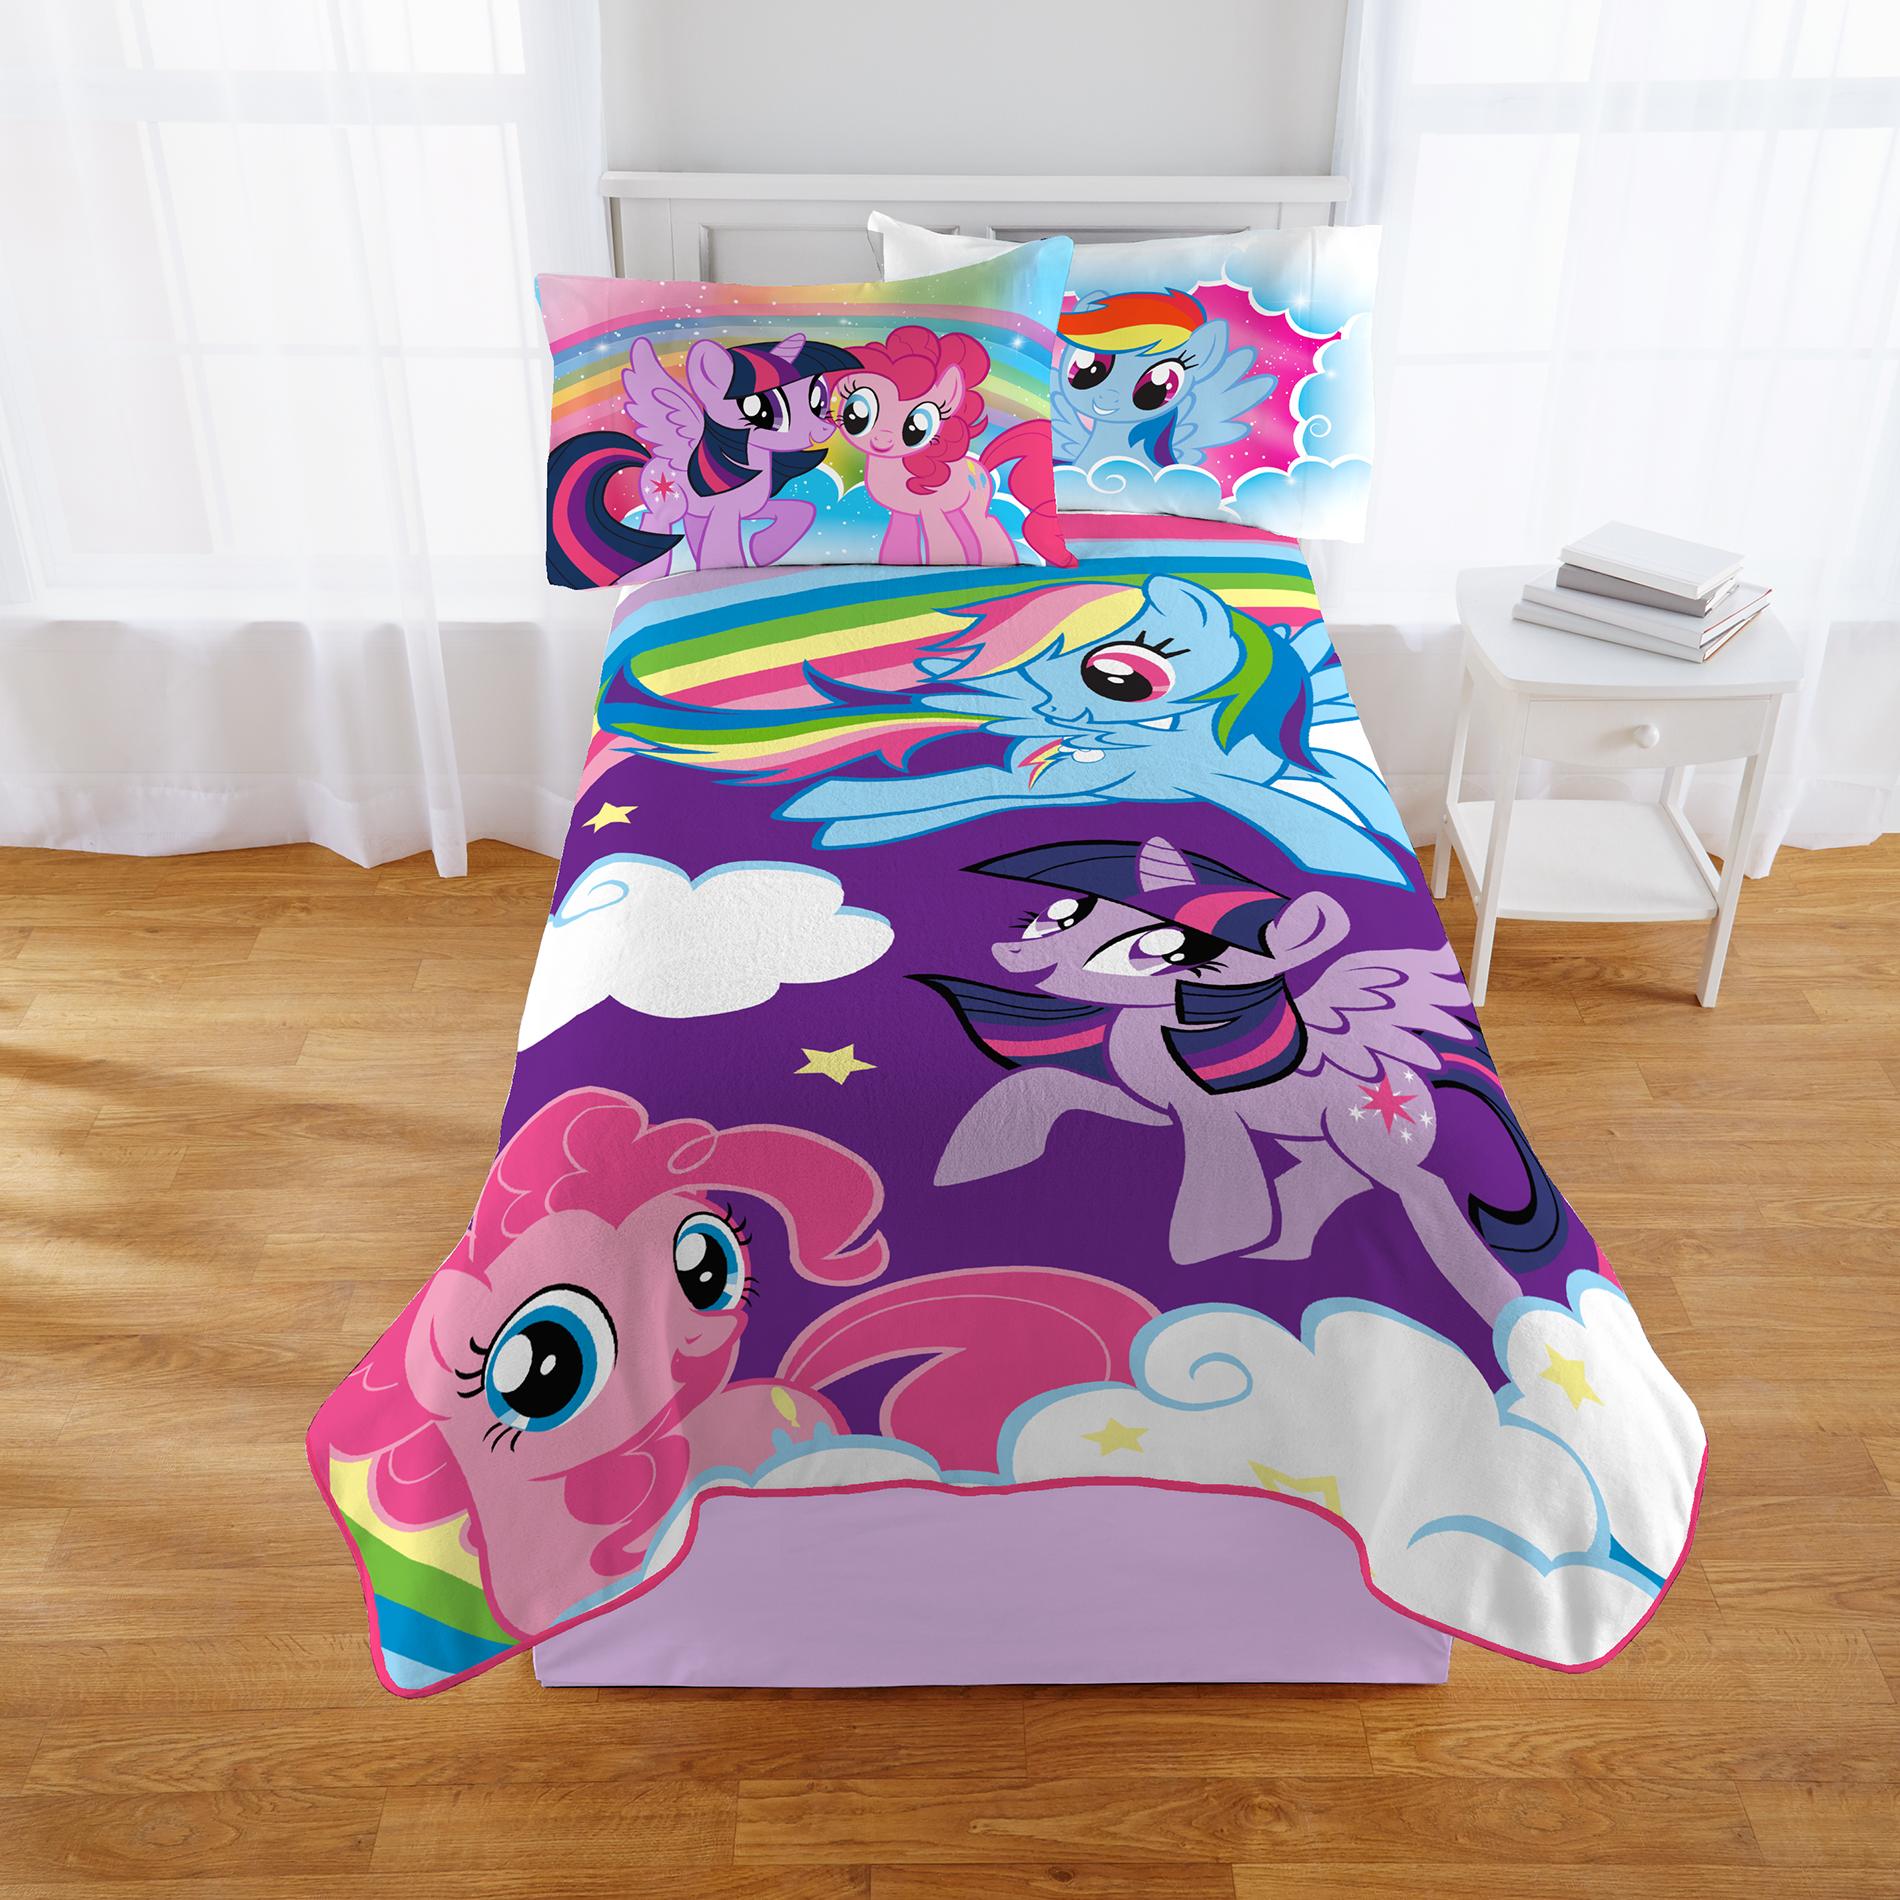 Hasbro My Little Pony Kids Blanket - Multicolored PartNumber: 048W009488291001P KsnValue: 048W009488291001 MfgPartNumber: A4491K